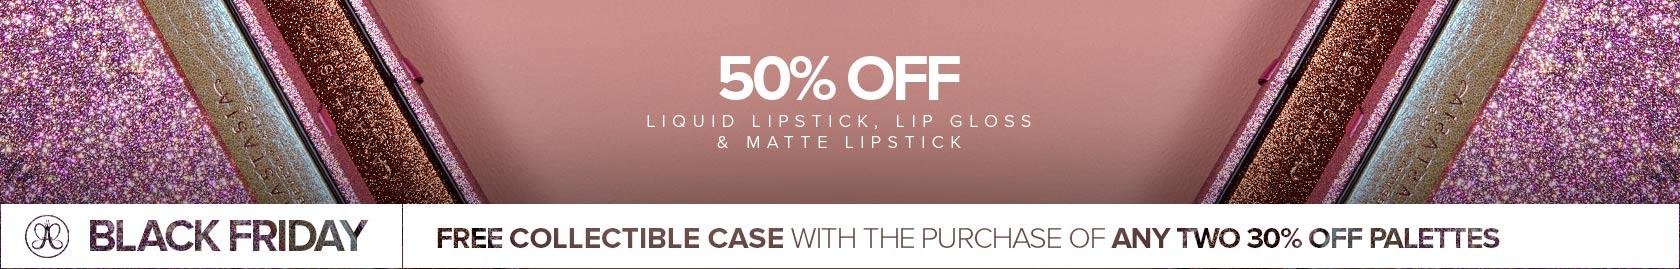 50% off Liquid Lipstick, Lip Gloss and Matte Lipstick